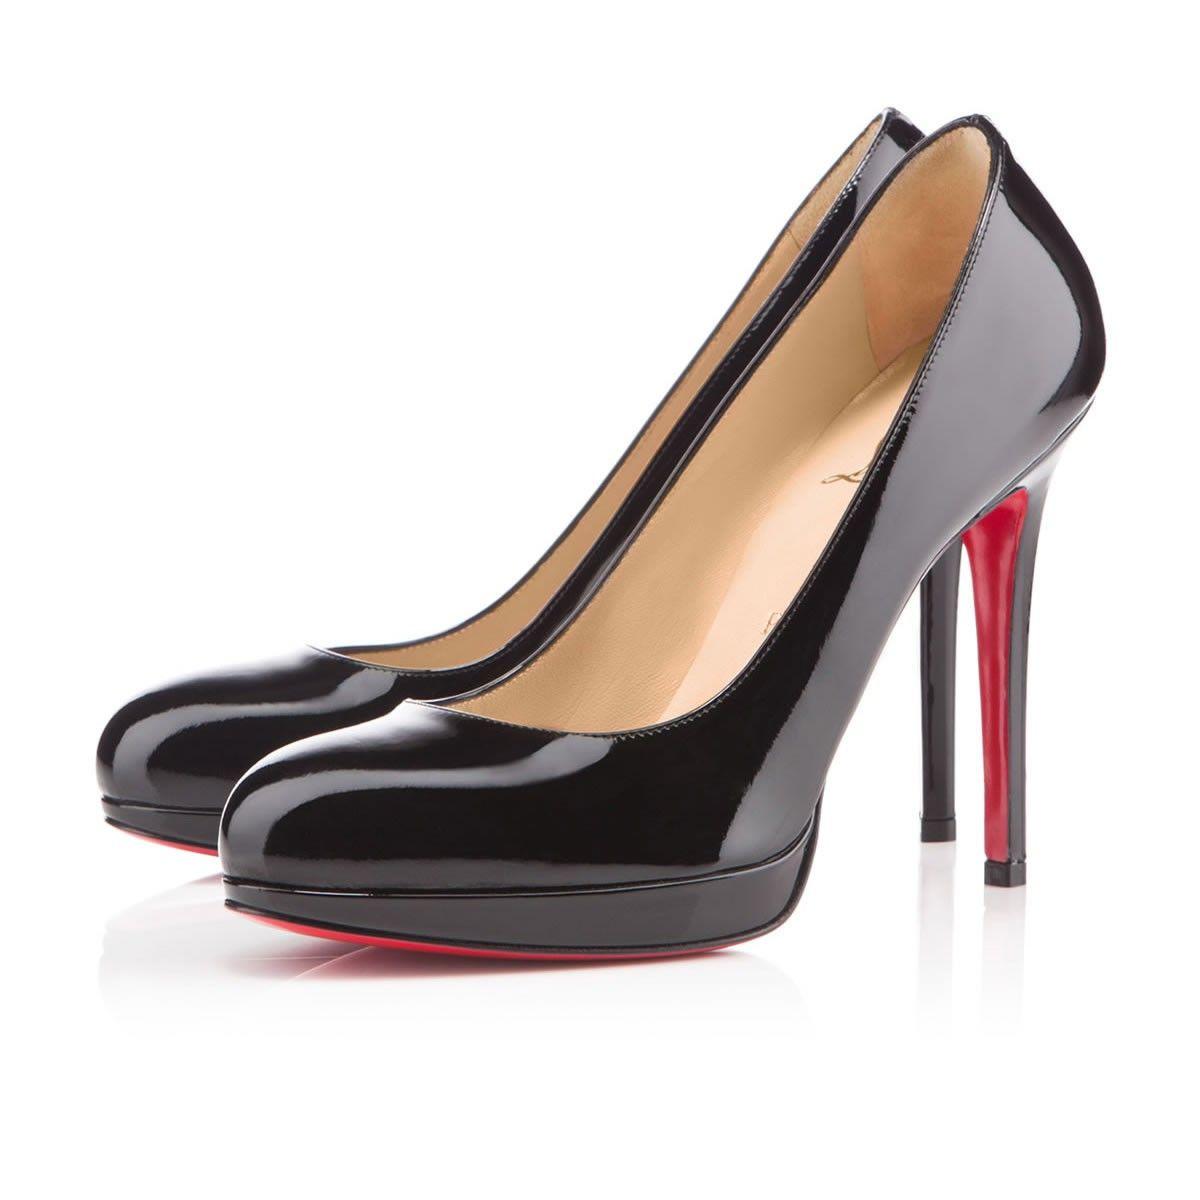 7f1332cc429 New Simple Pump 120 Black Patent Leather - Women Shoes - Christian ...